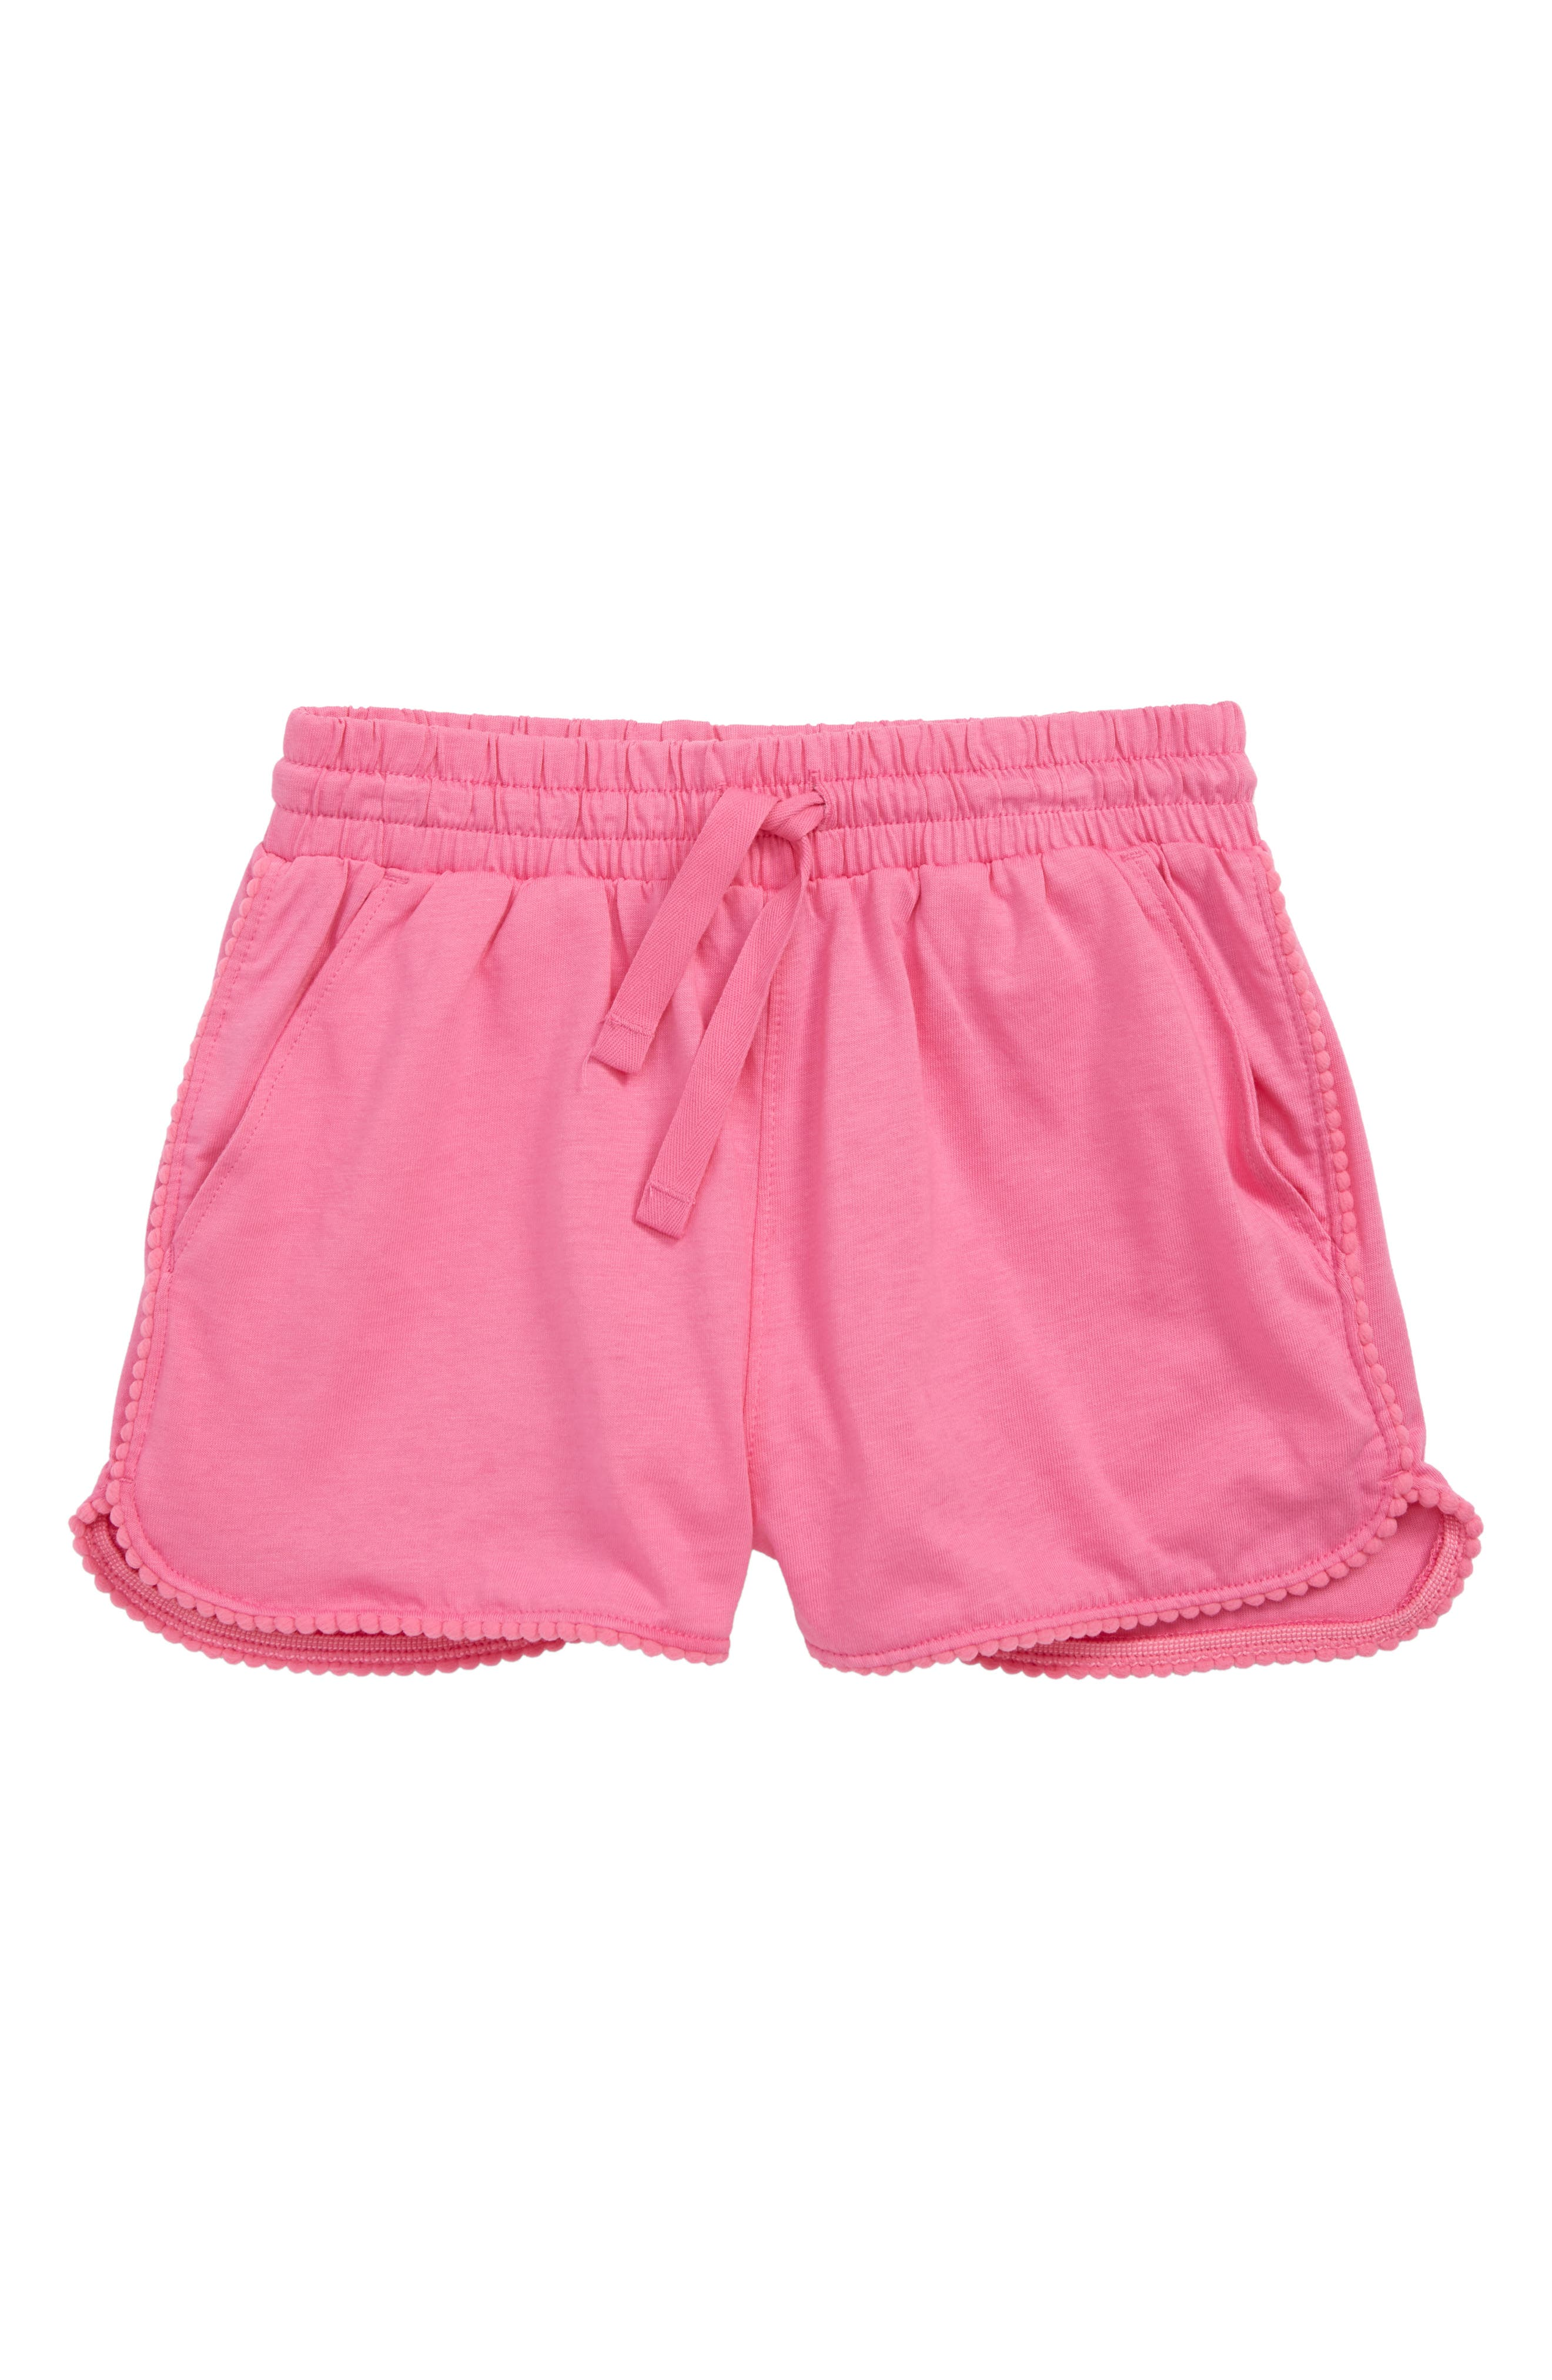 Girls Tea Collection Pom Pom Dolphin Hem Shorts Size 7  Pink